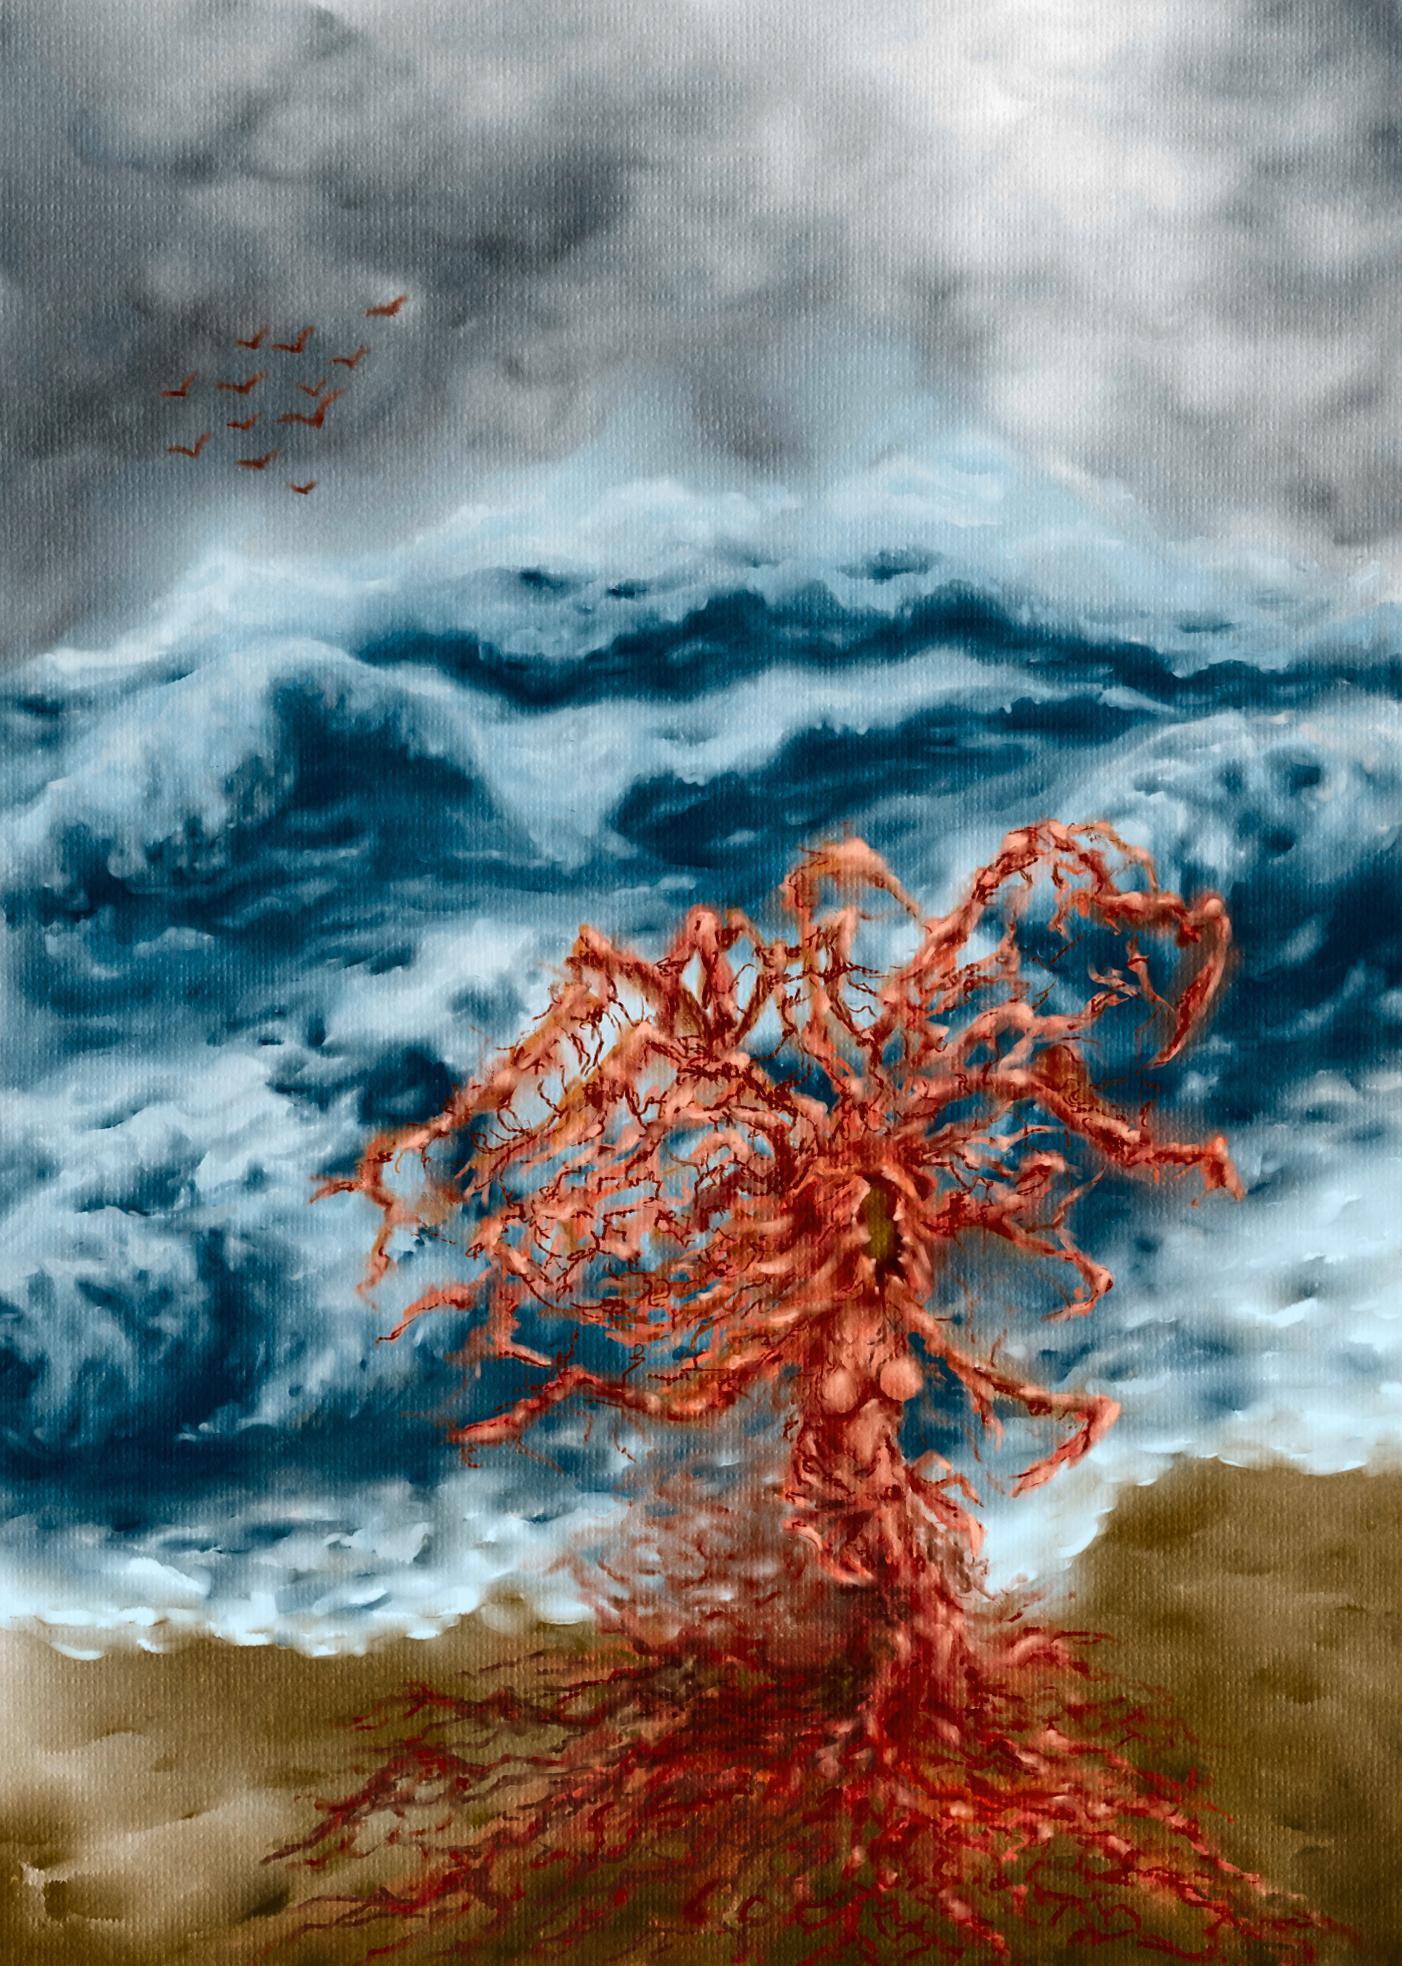 Storm_in_the_bay.jpg